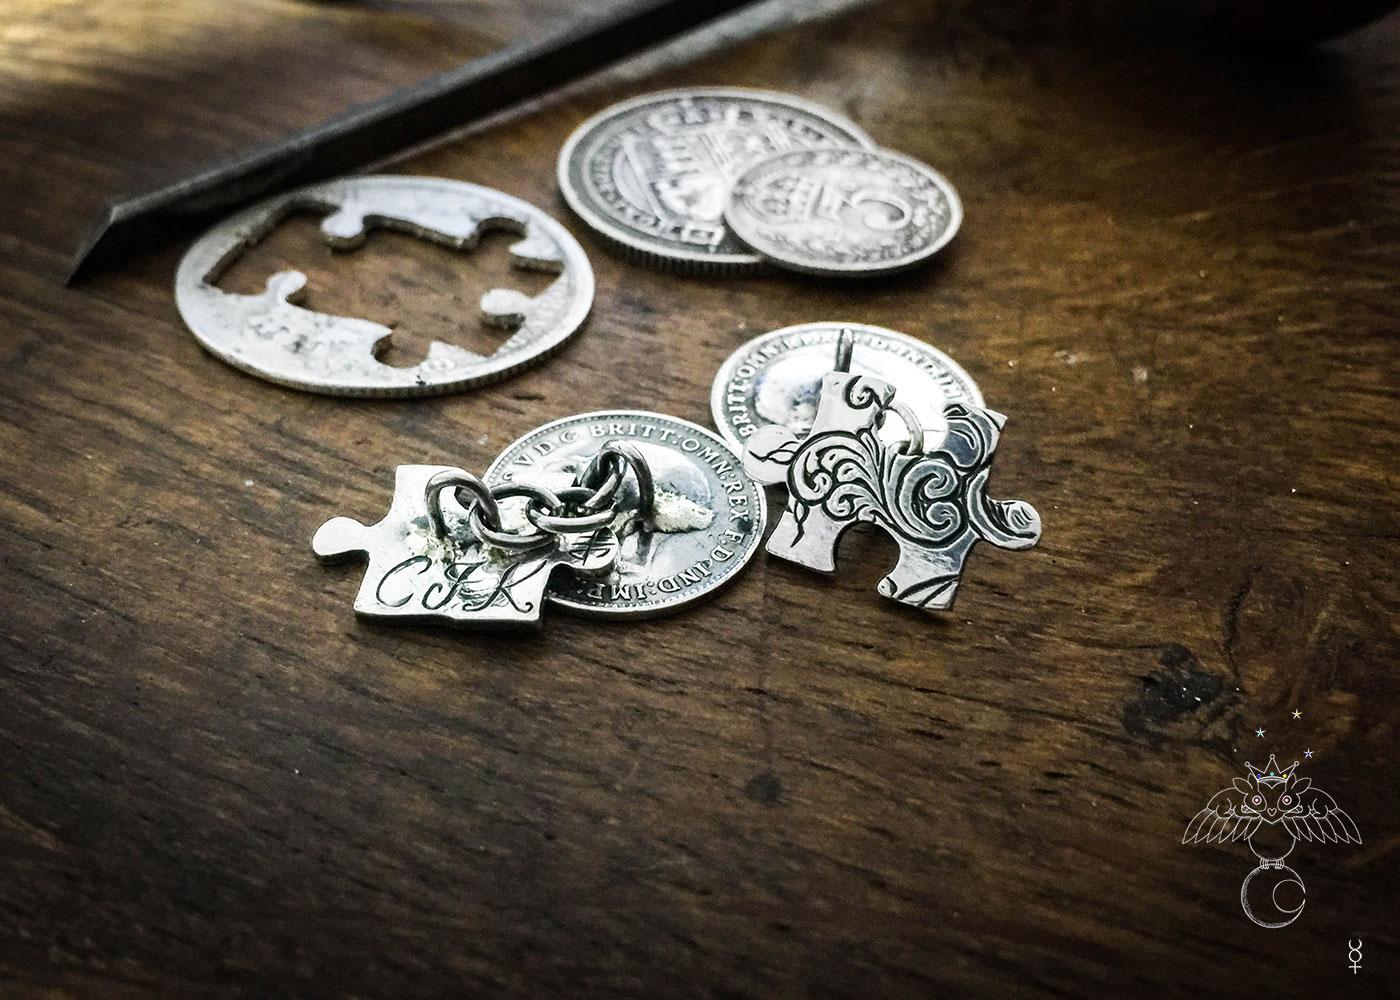 Ethical jewellery. Handmade and repurposed lucky threepence coin jigsaw cufflinks